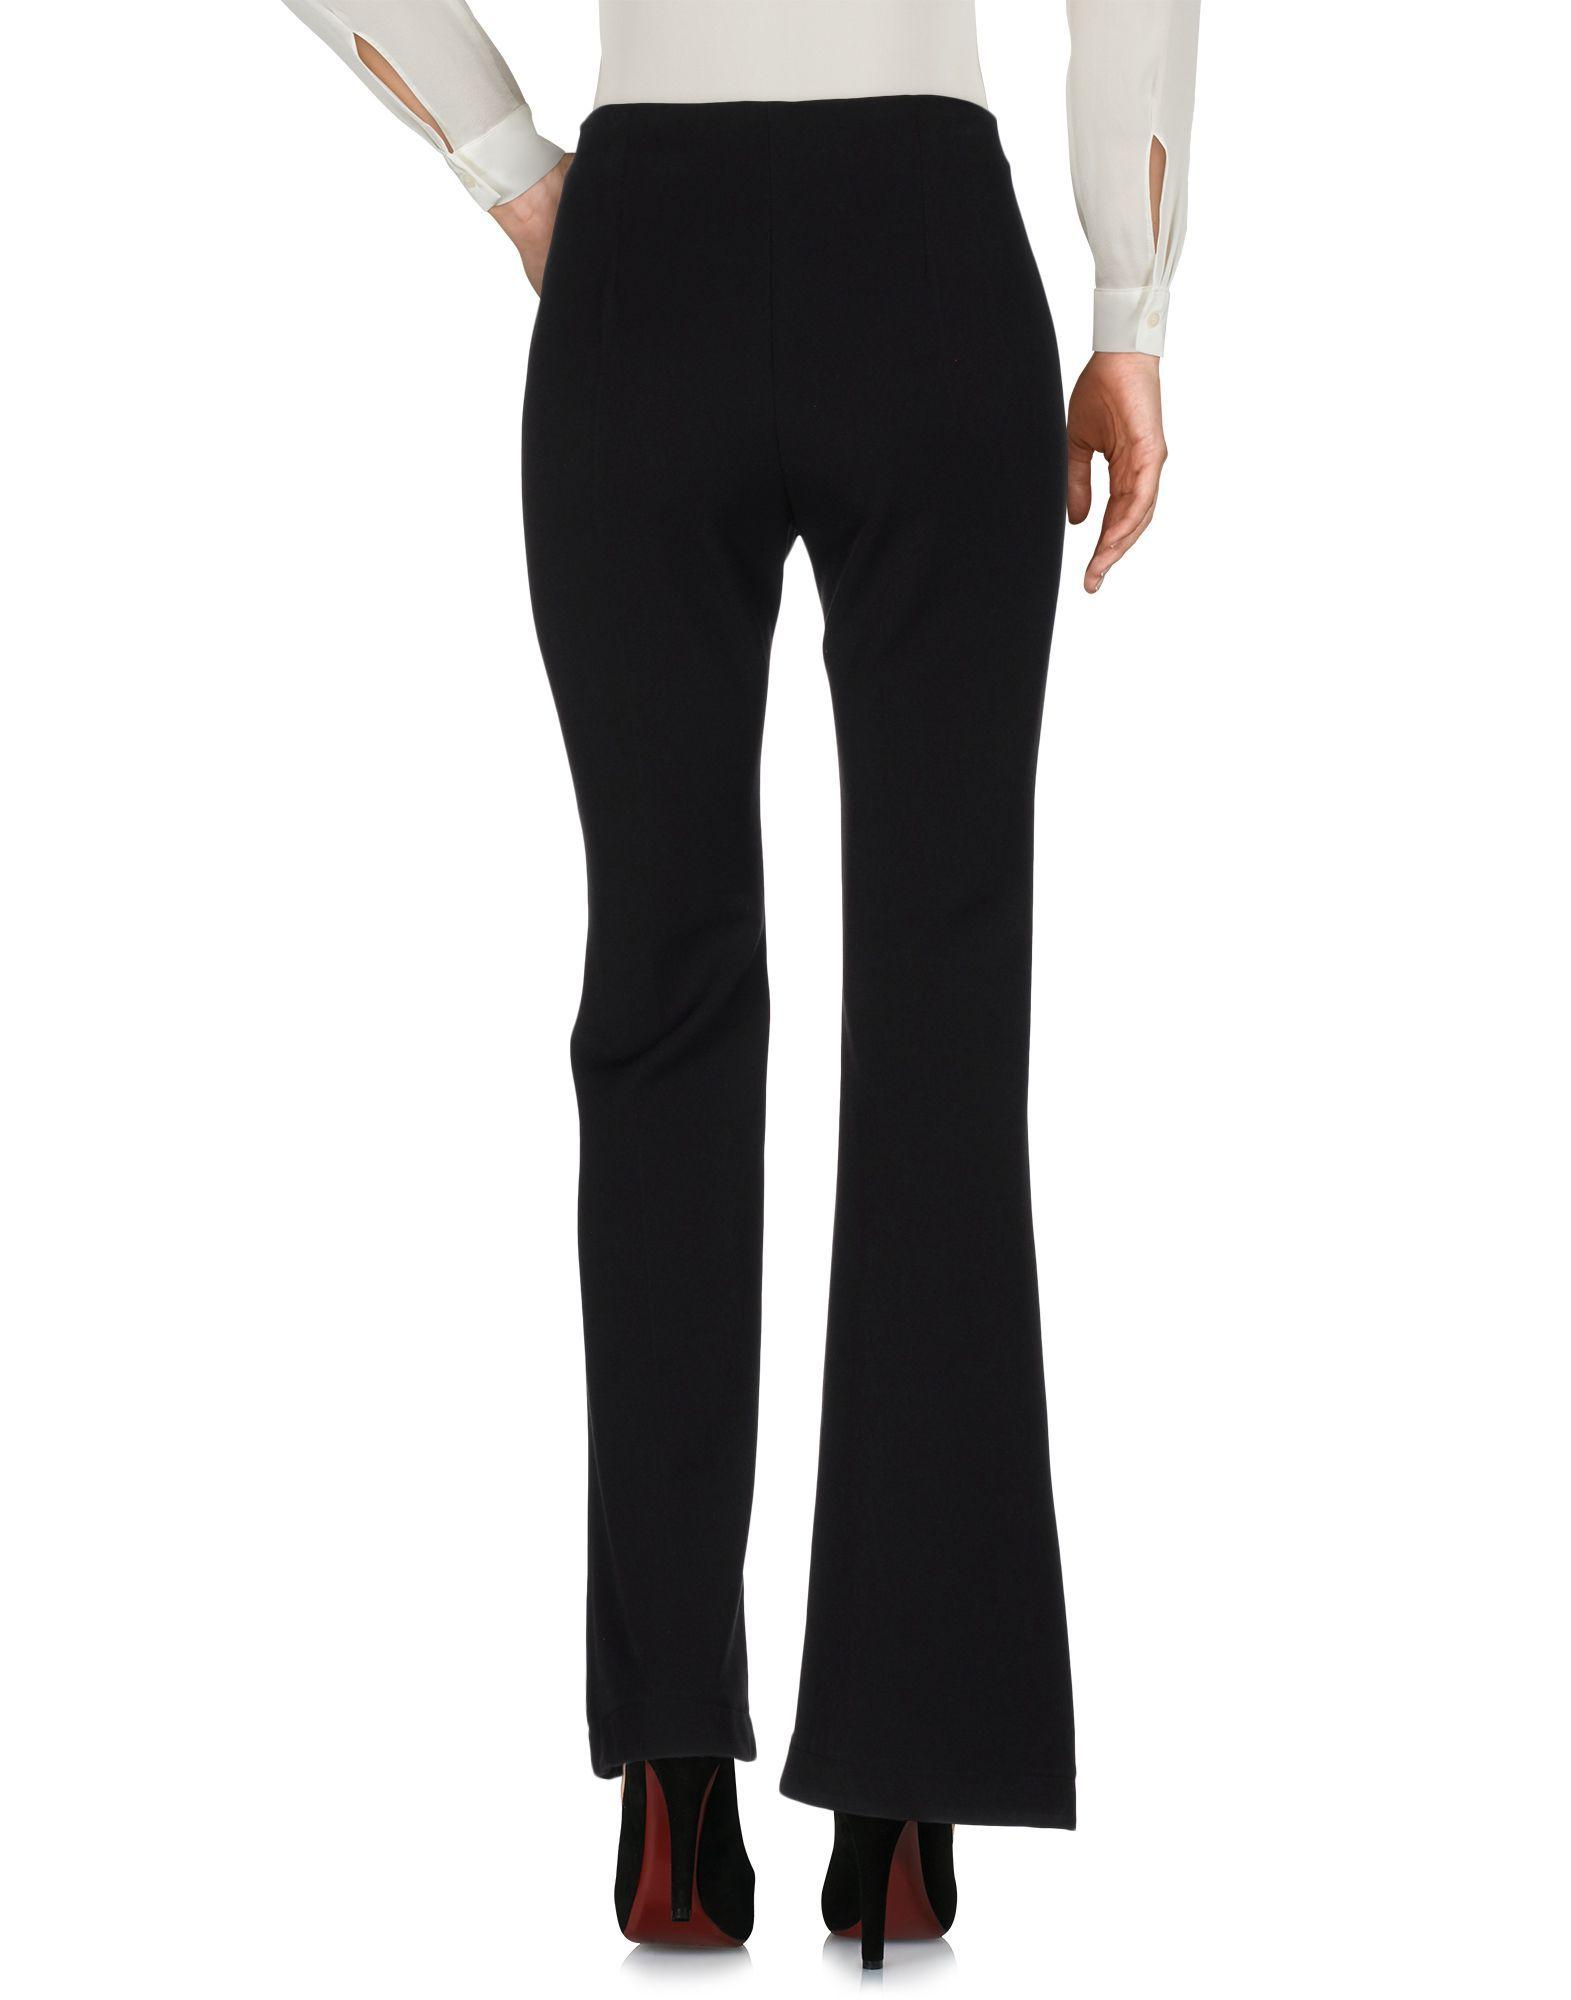 Pf Paola Frani Black Wool Trousers